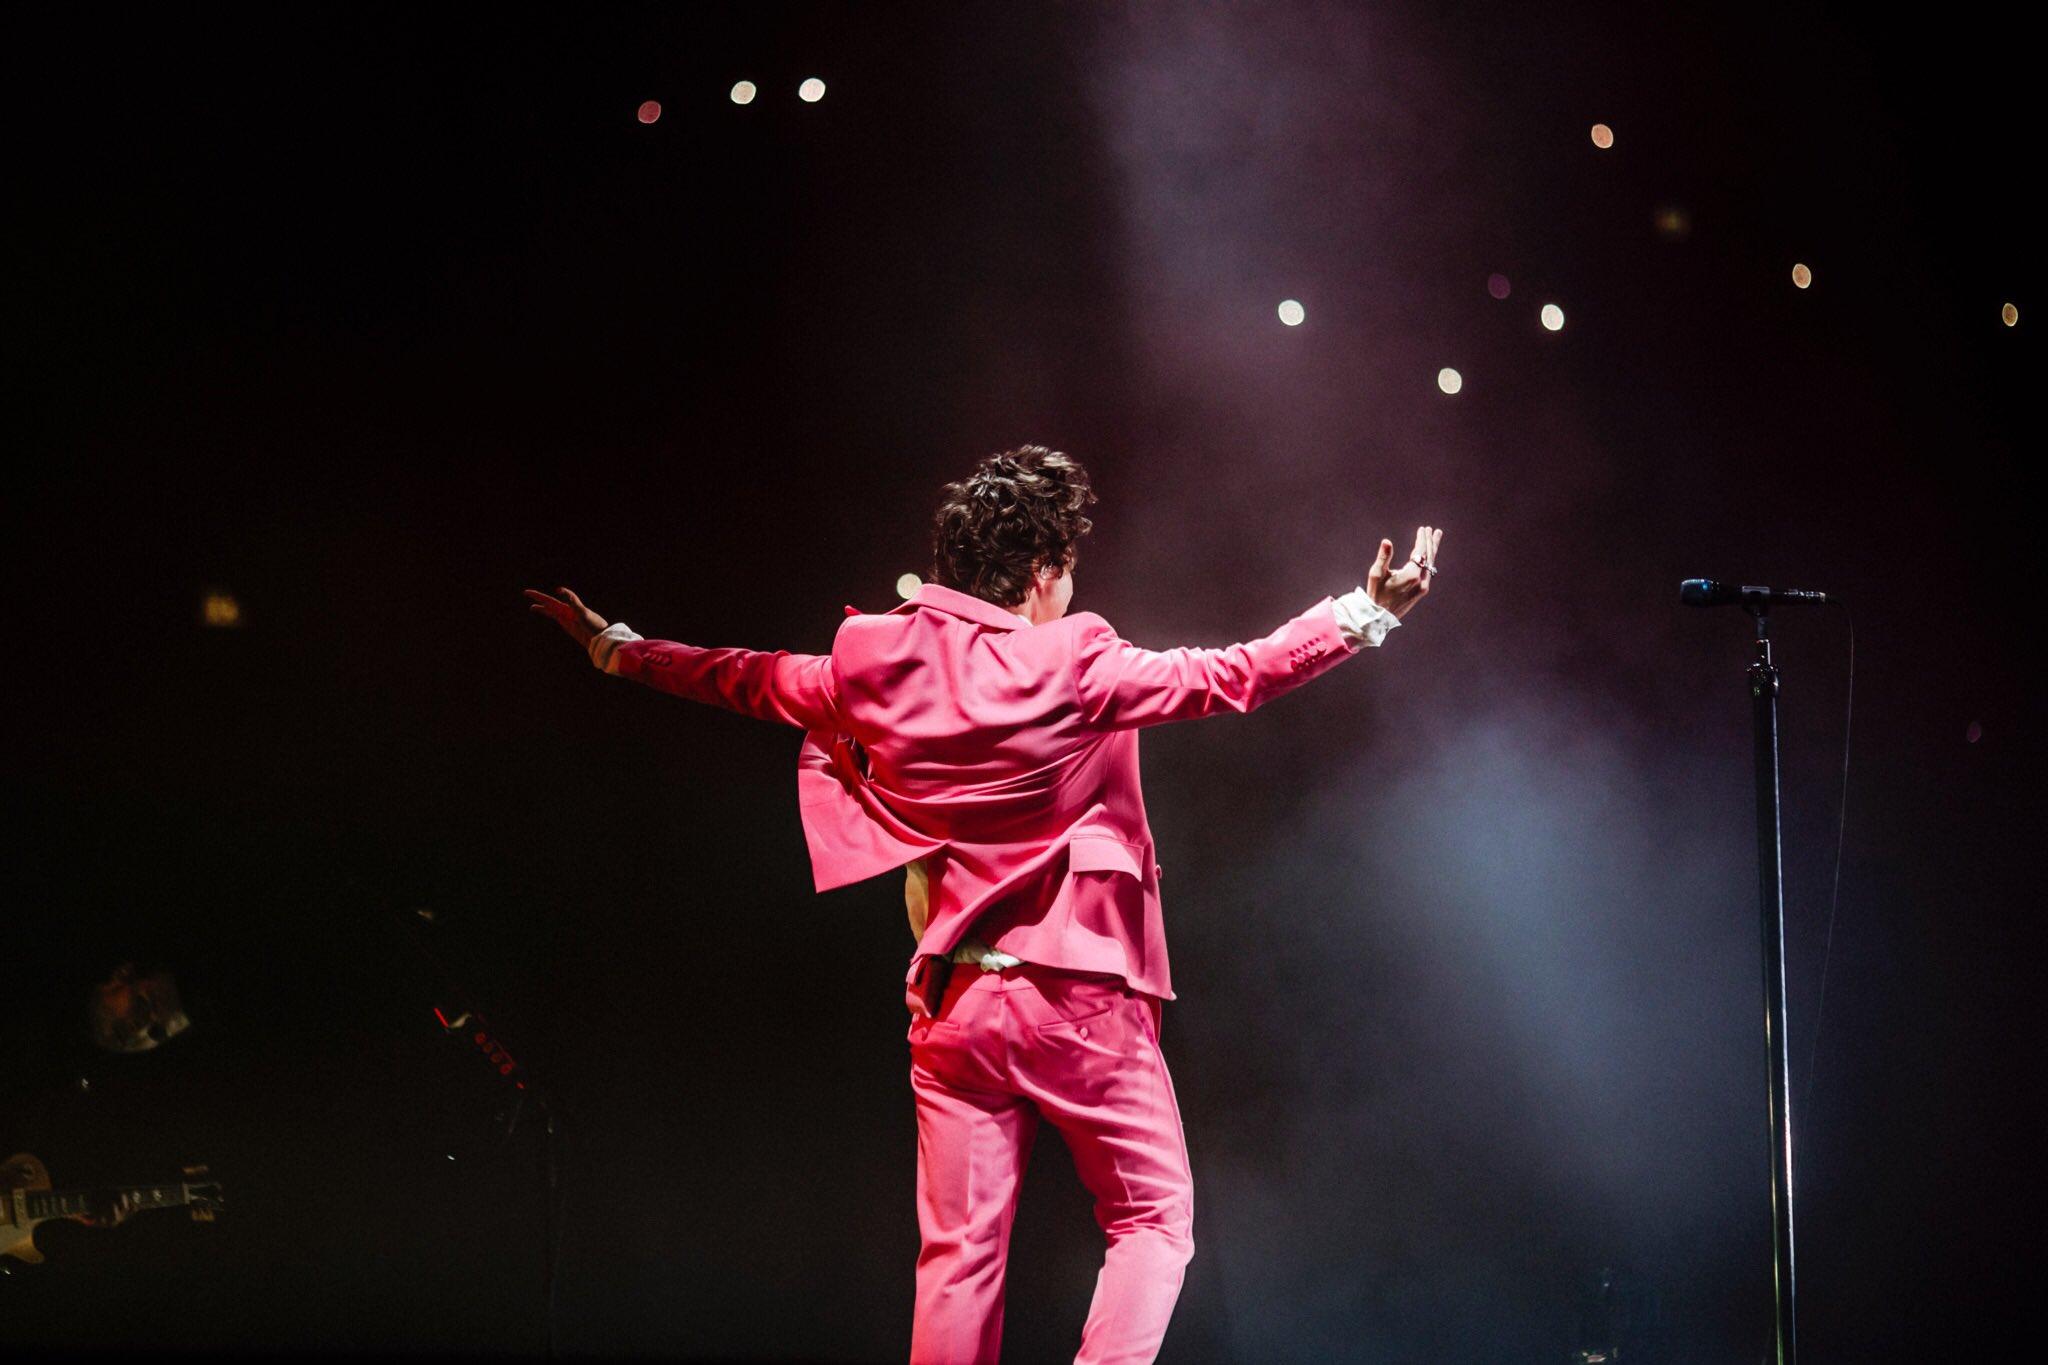 Bologna, Live On Tour. https://t.co/rnLXZtBs4L